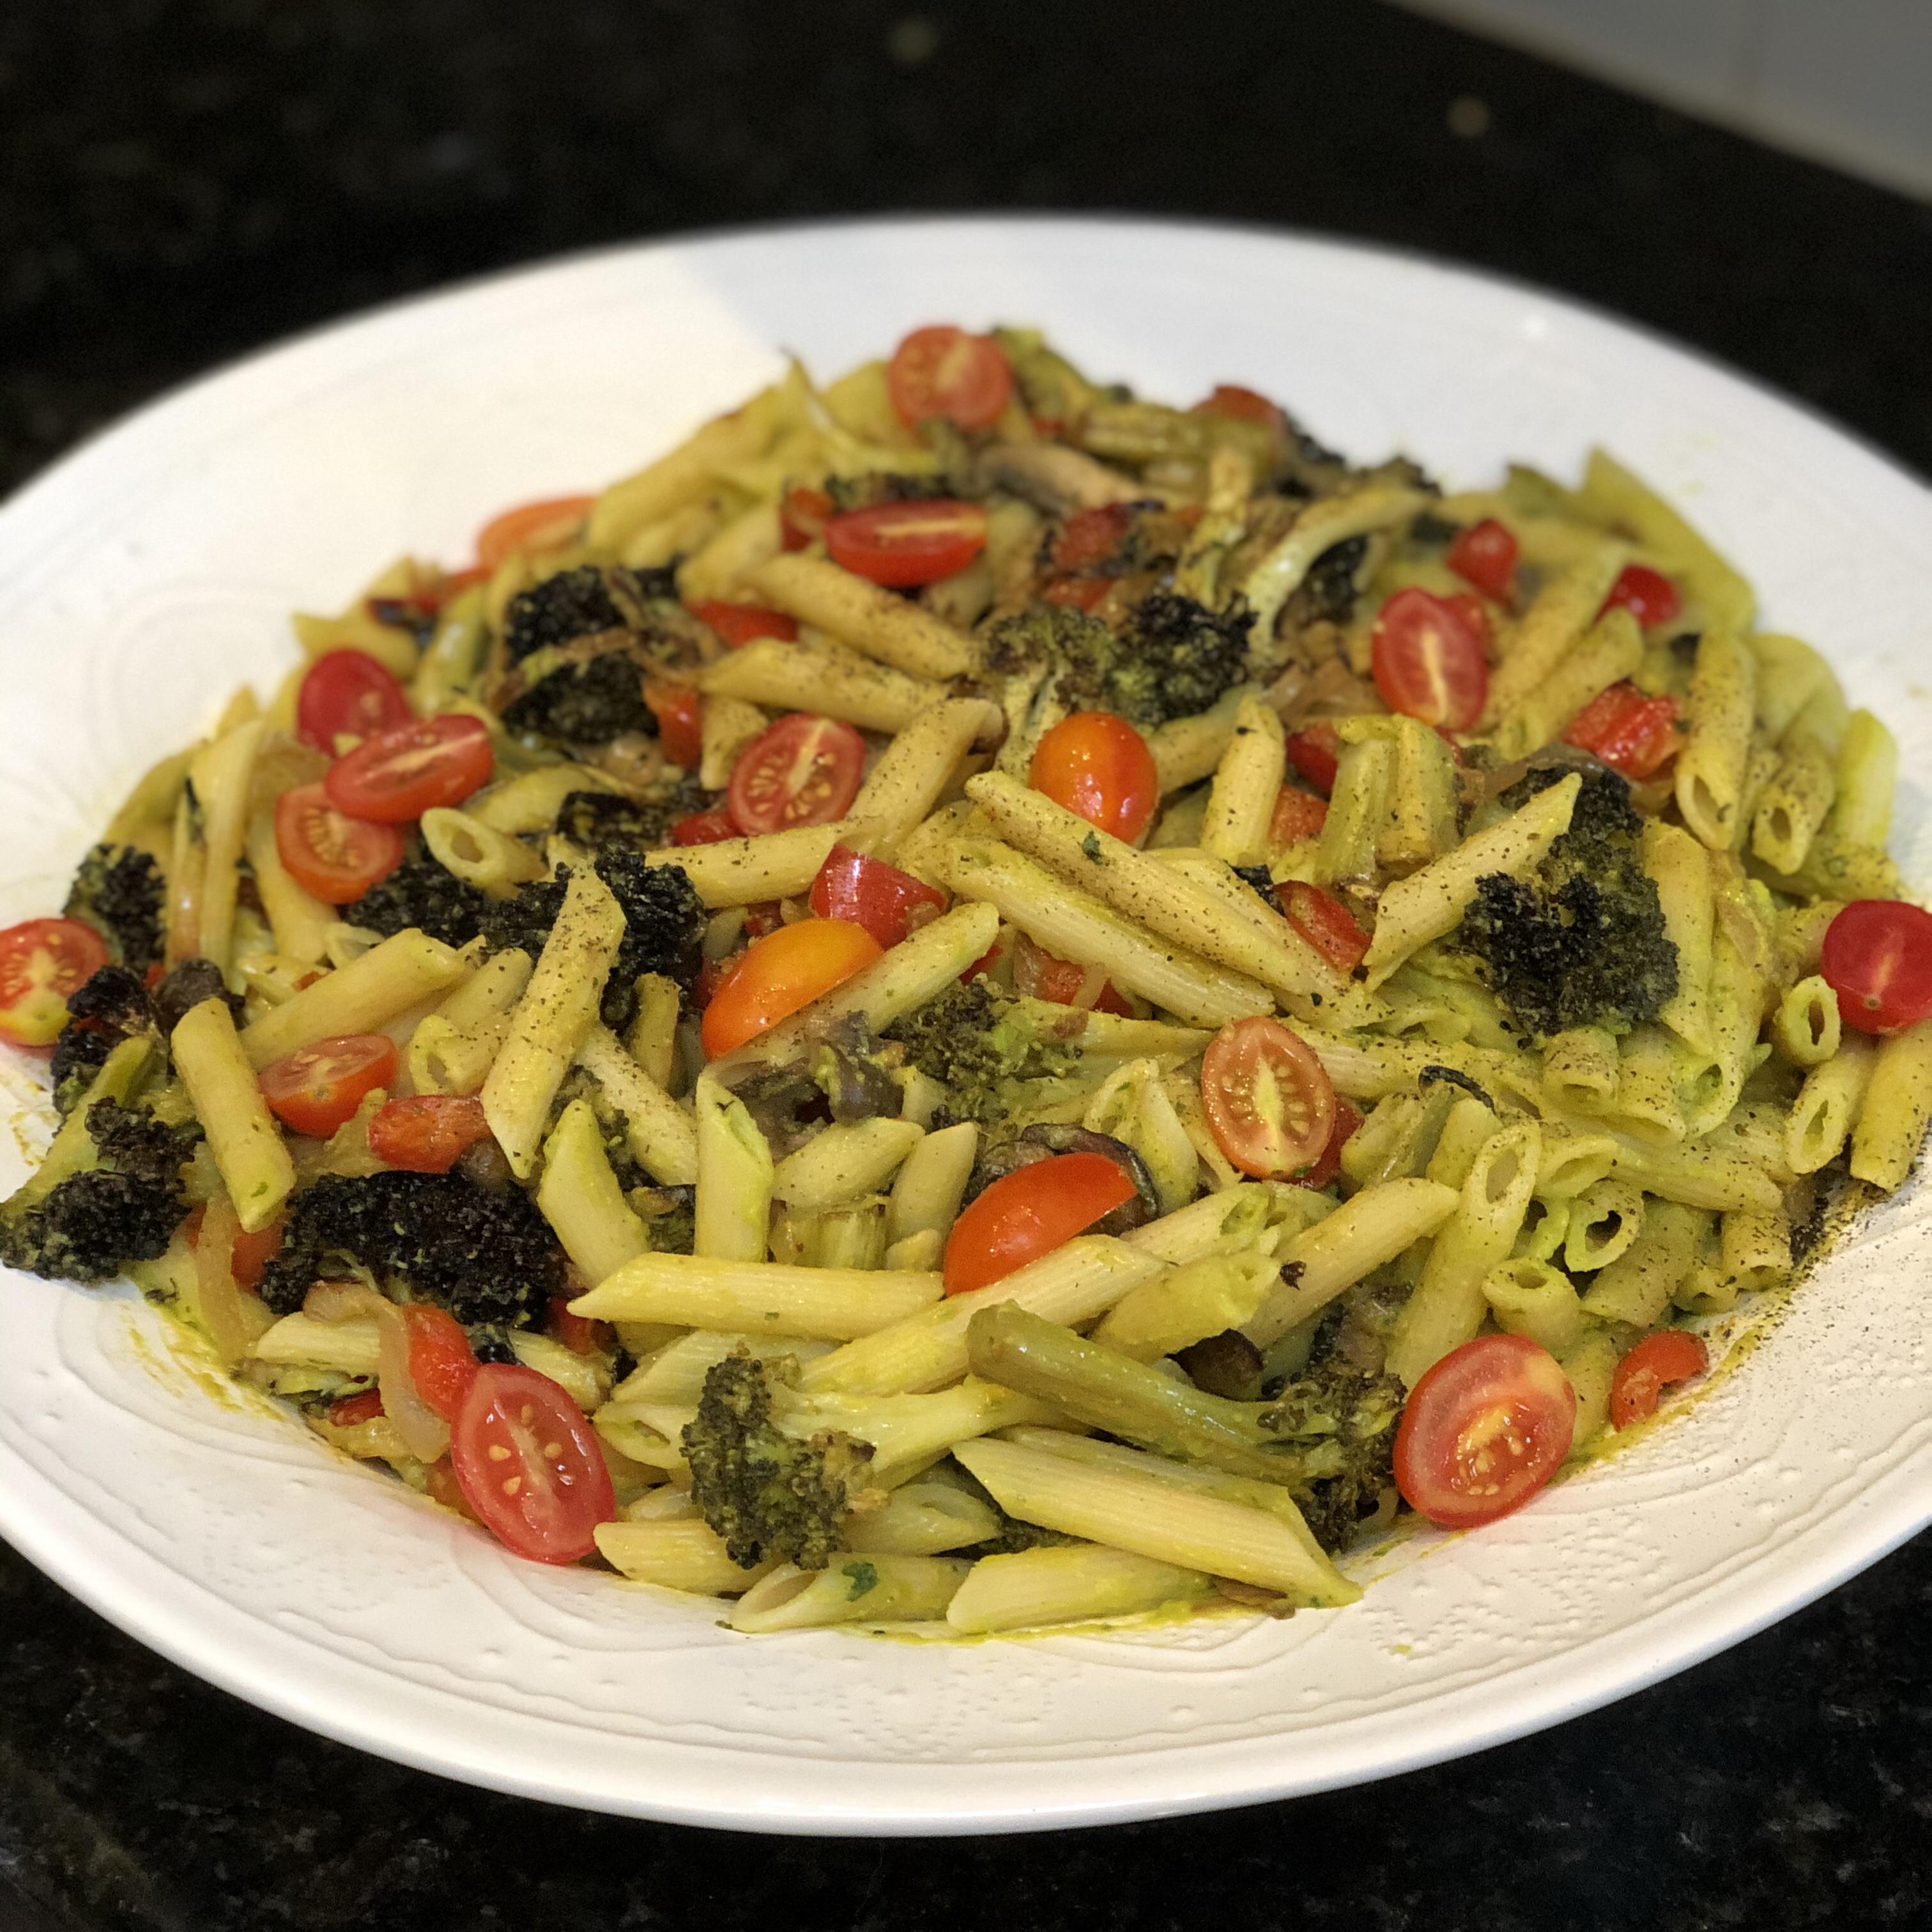 Vegan Avocado Pasta with Blackened Vegetables ShellyGirl